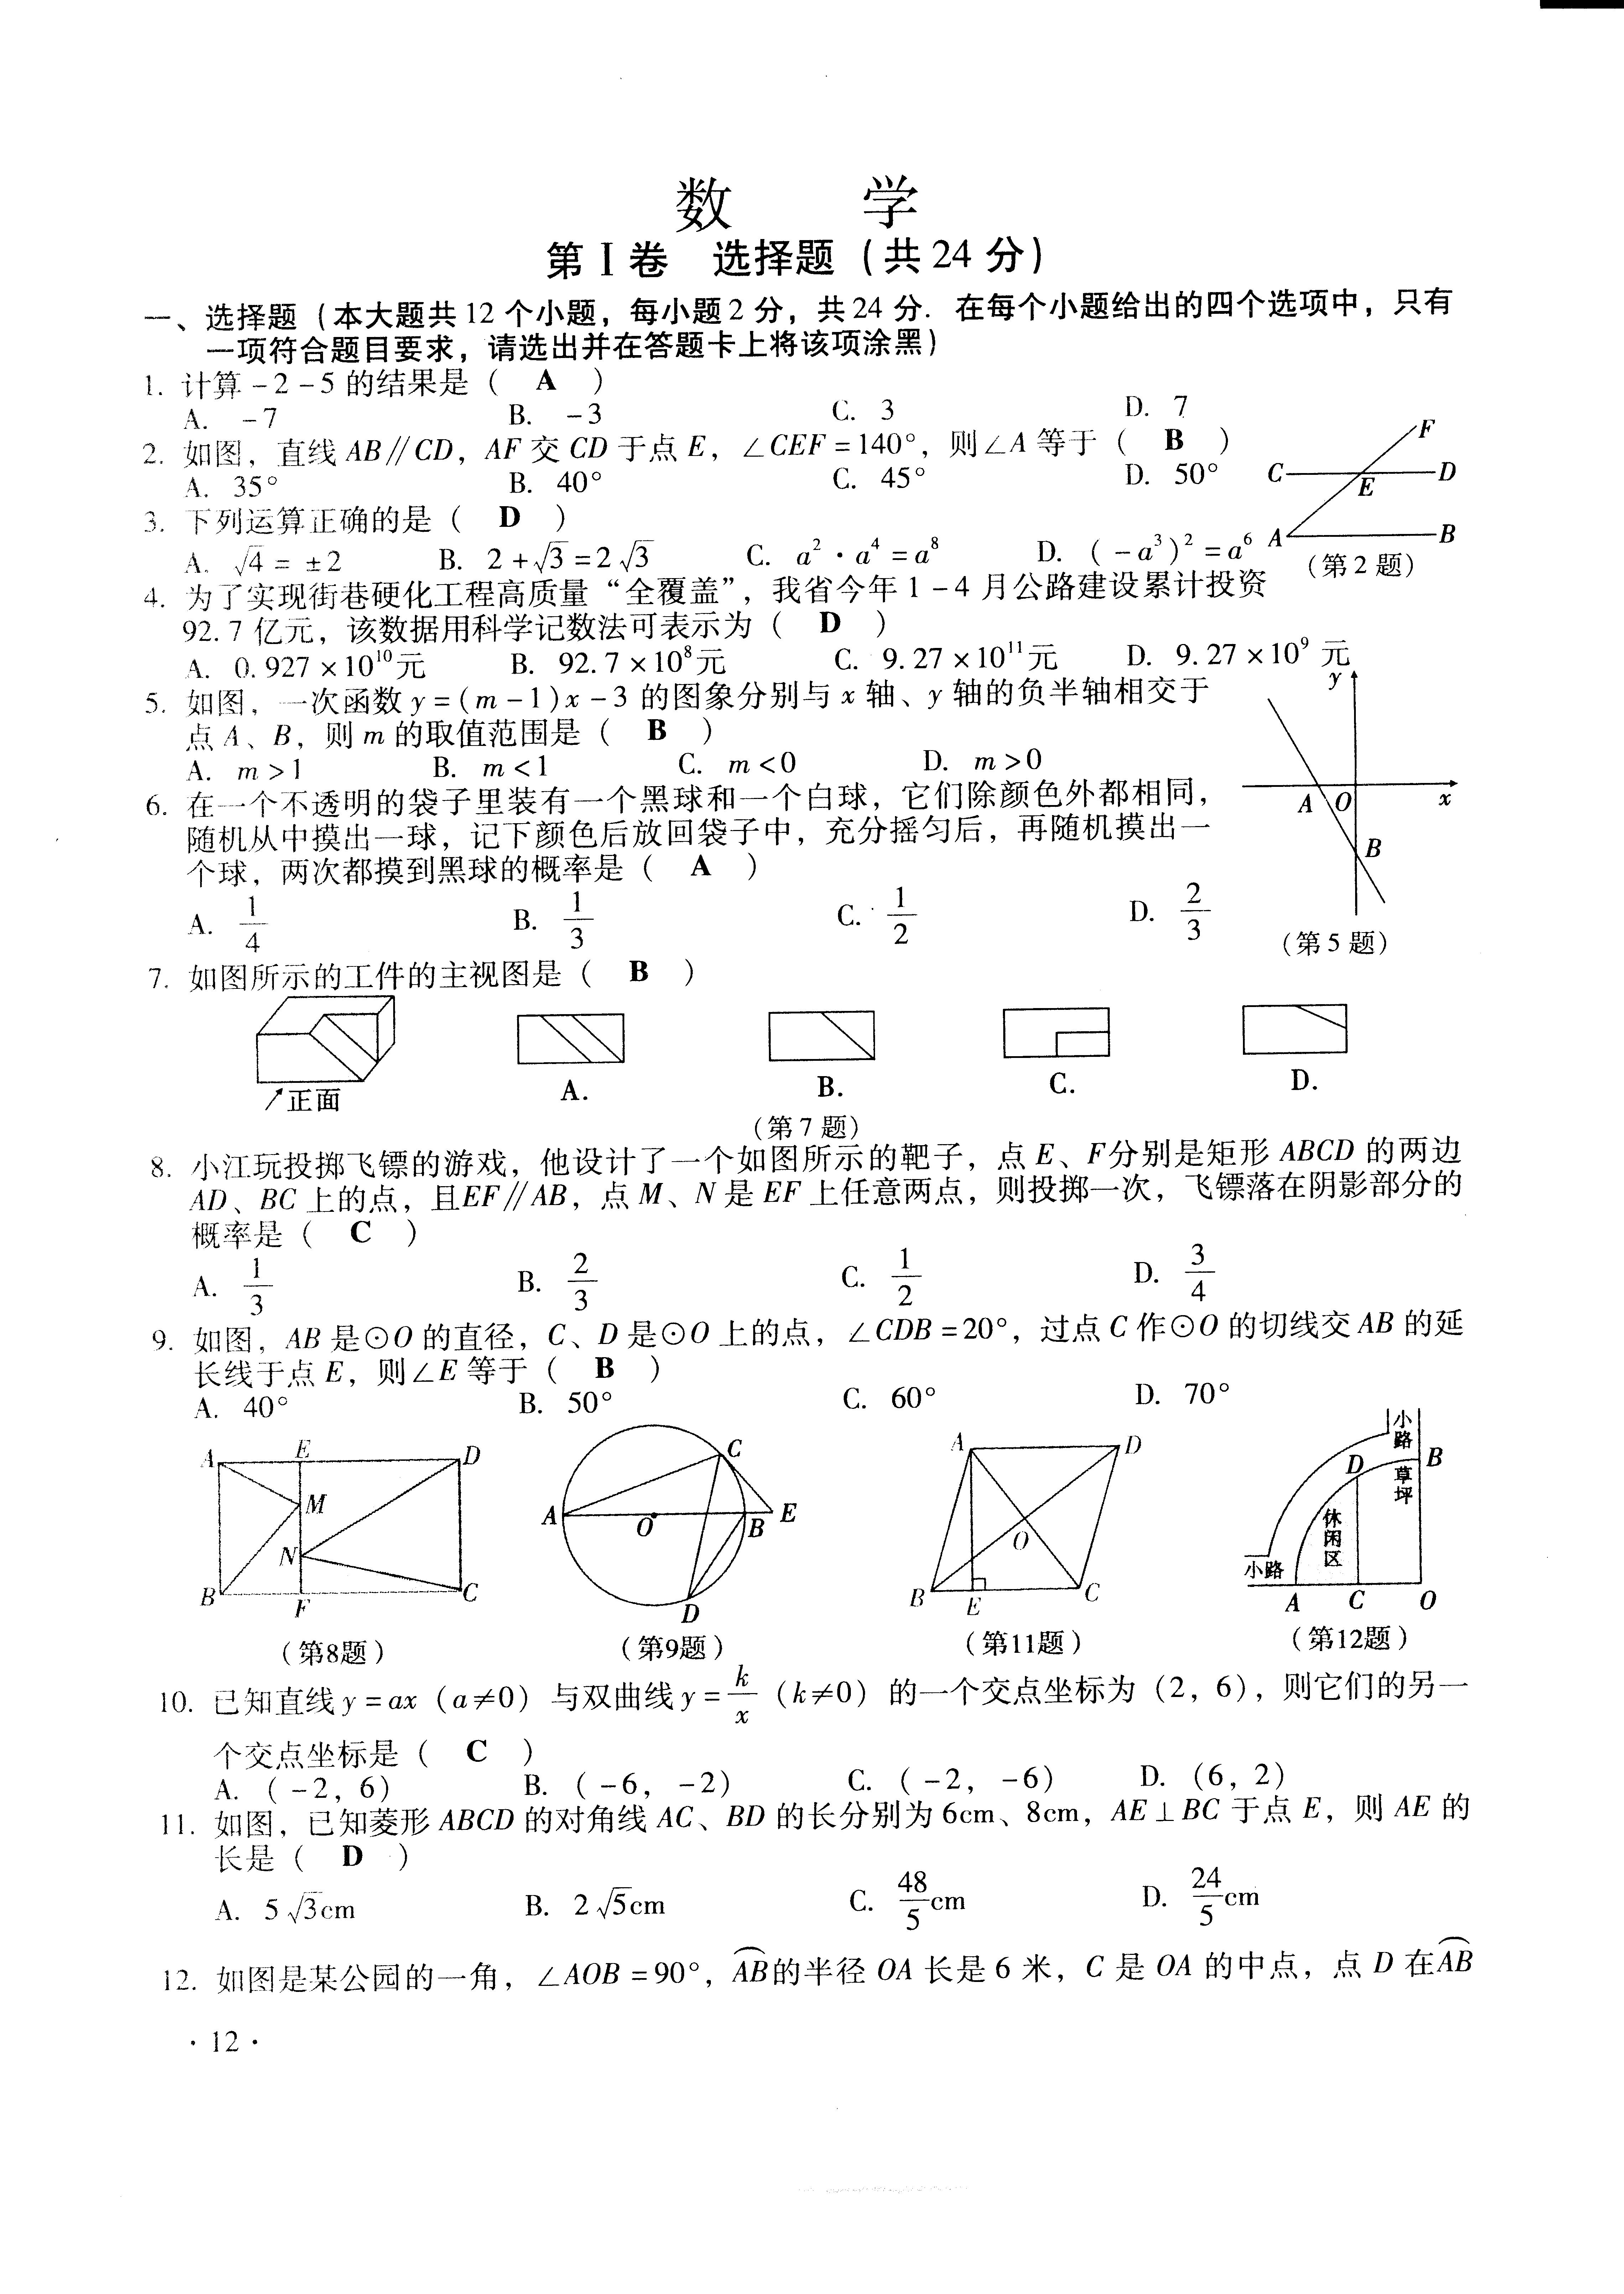 http://i1.w.hjfile.cn/doc/201112/20091210945386939.jpg_http://f1.hjfile.cn/file/201402/2012年山西中考数学试题及答案.